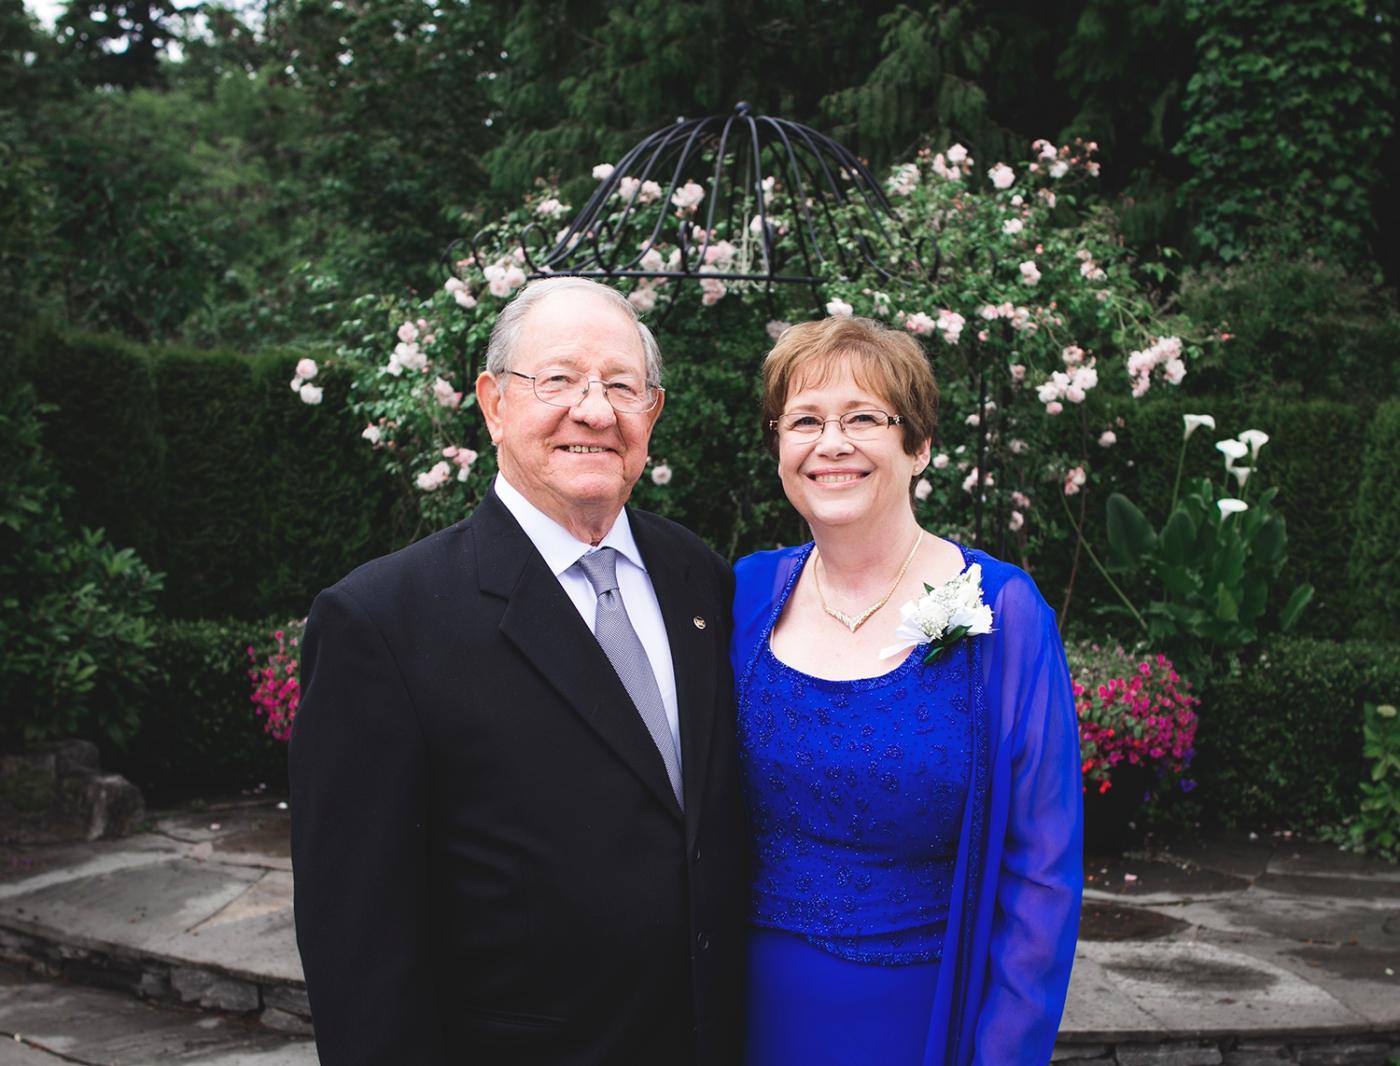 Jane_Speleers_2016_Family_Wedding_Wild_Rose_Estates_Venue_ DSC_DSC_9961